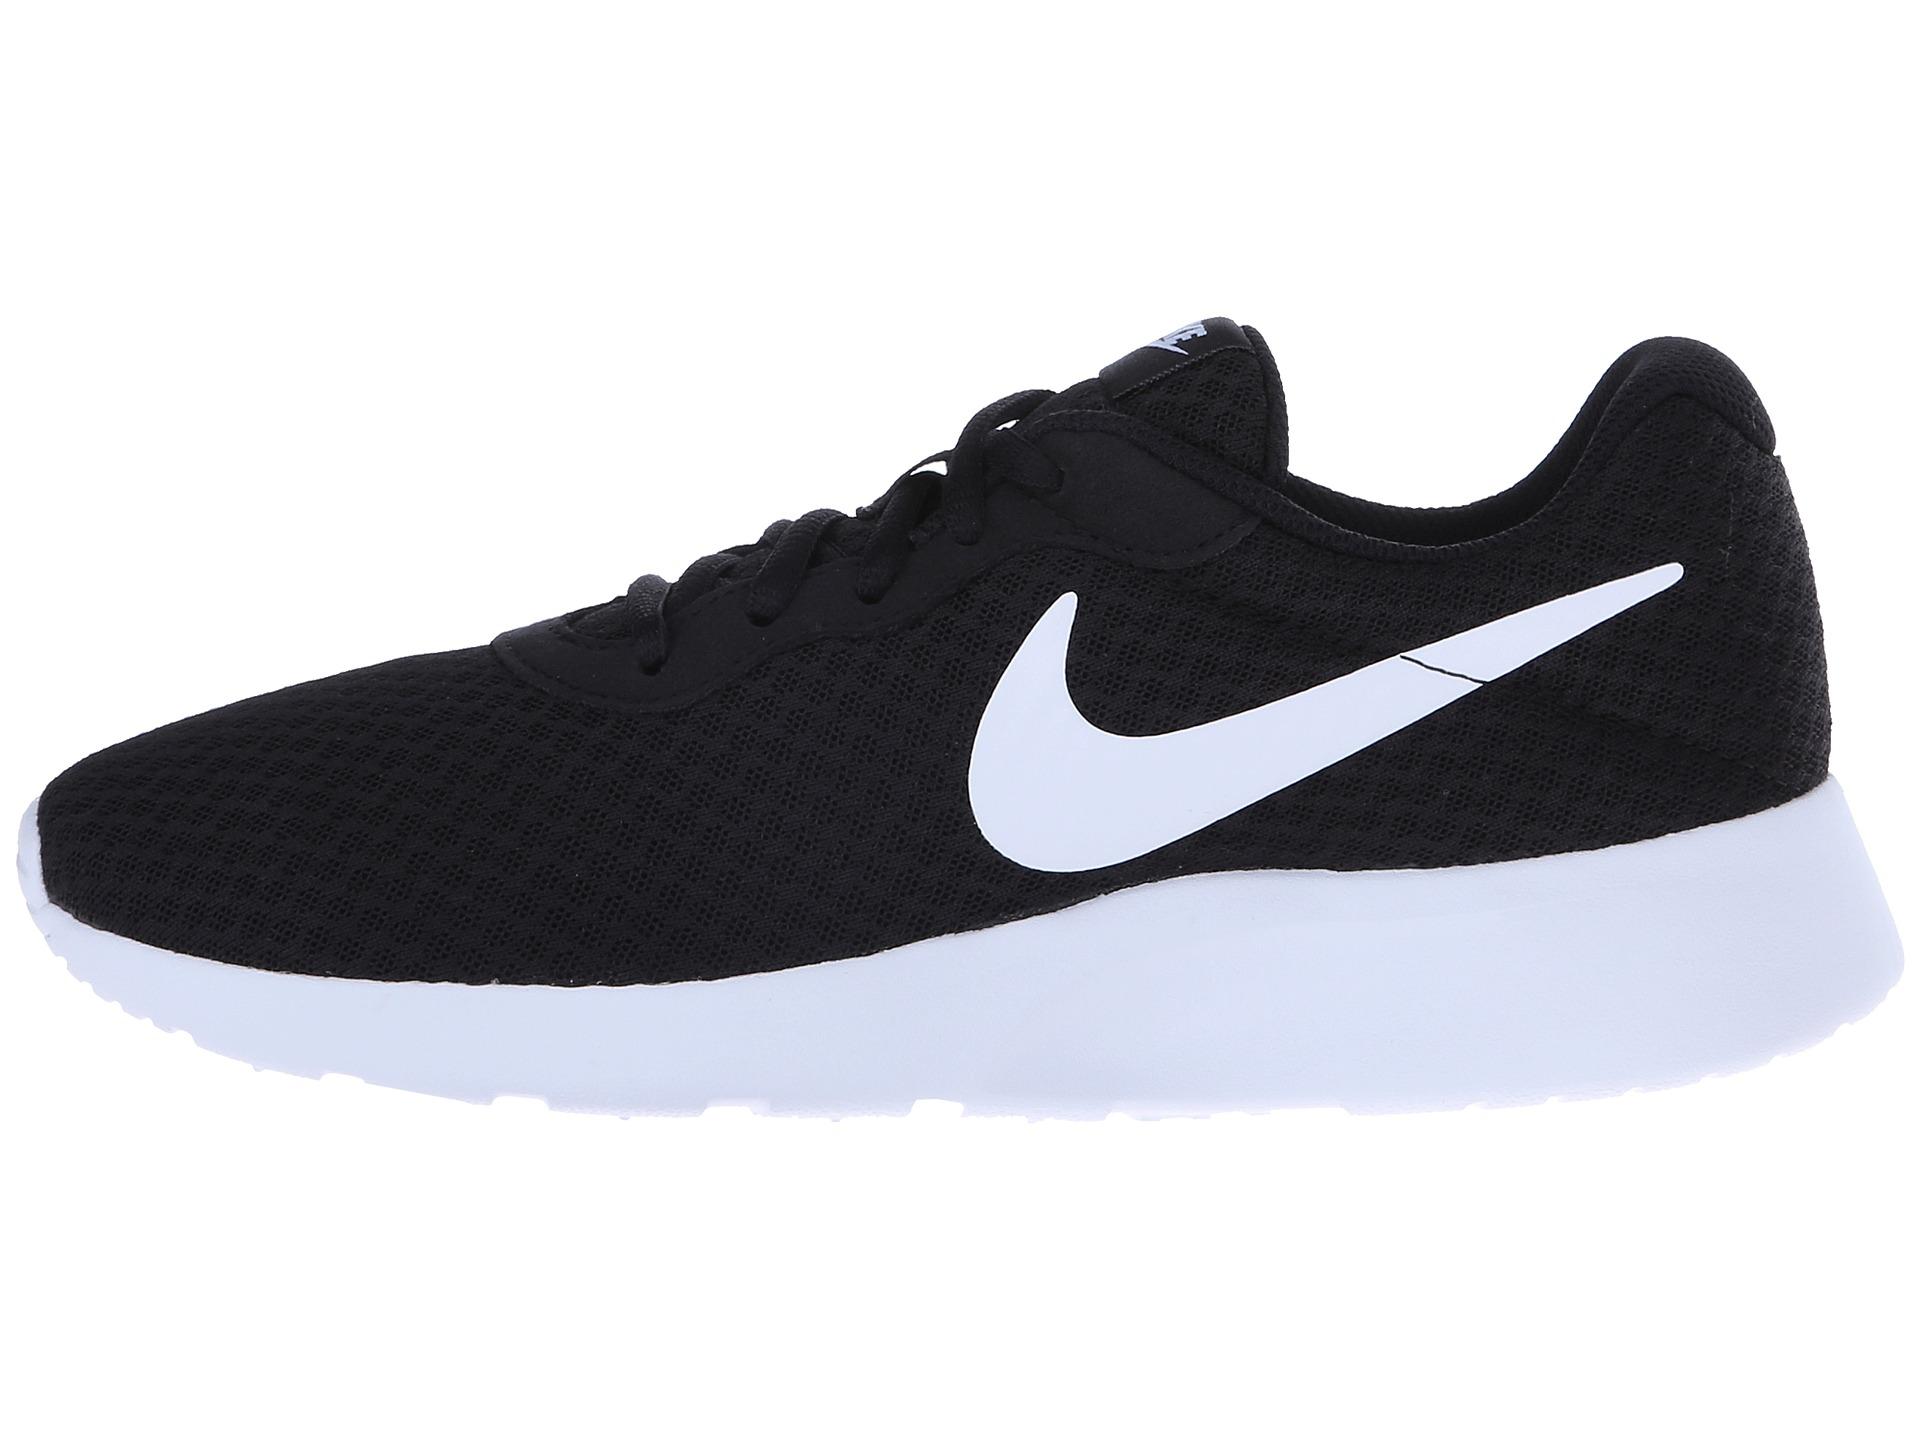 Nike Tanjun Women S Athletic Shoes White And Black